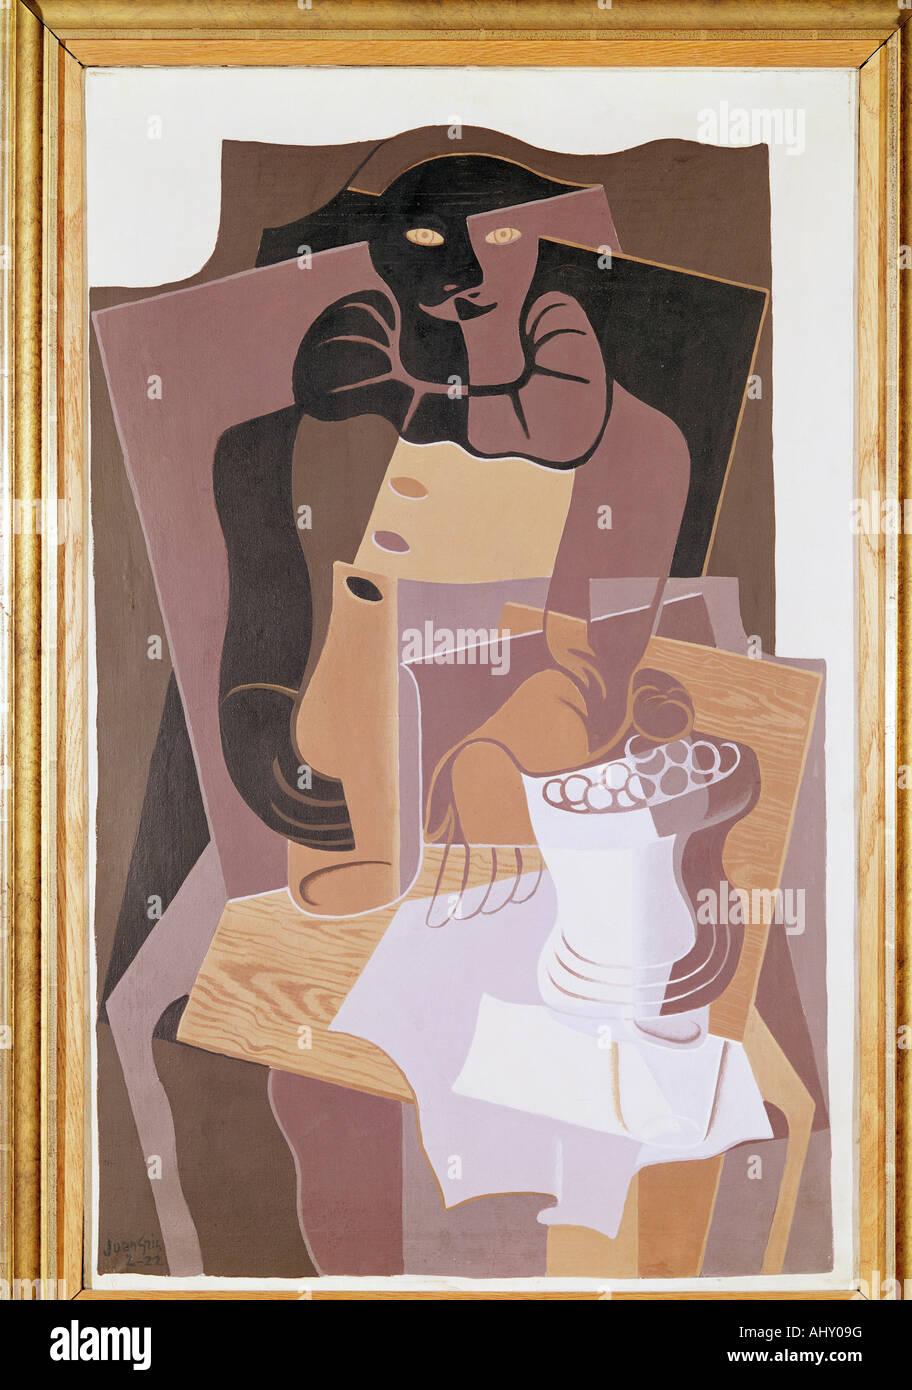 """Bellas Artes, Gris, Juan (1887 - 1927), pintura, ""Pierrot"", 1922, óleo sobre lienzo, 100 cm Imagen De Stock"